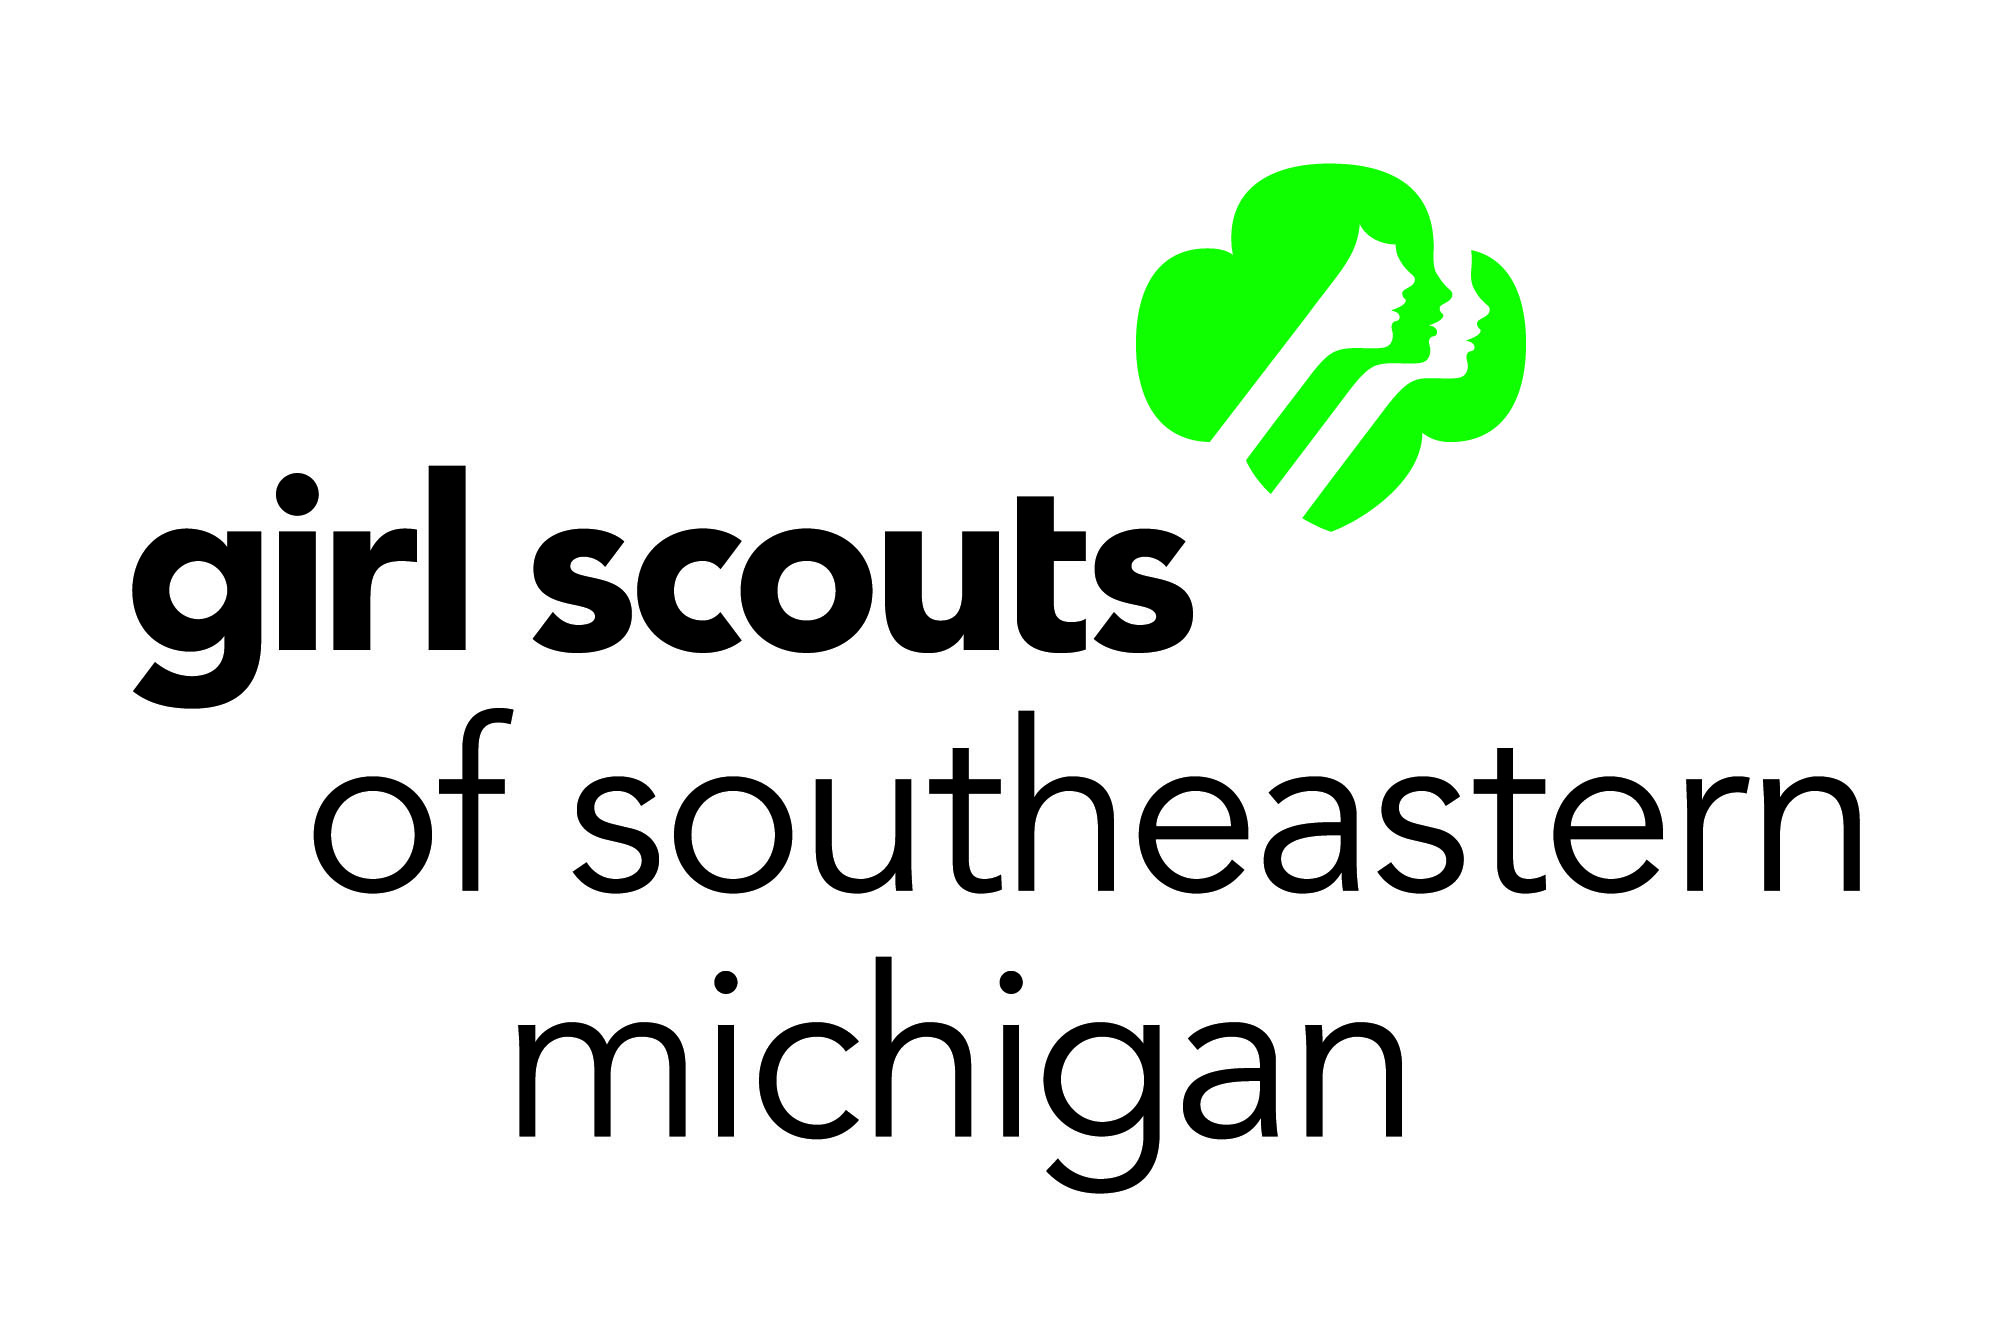 https://freepmarathon.s3.amazonaws.com/uploads/2016/07/Girl-Scouts-Logo.jpg